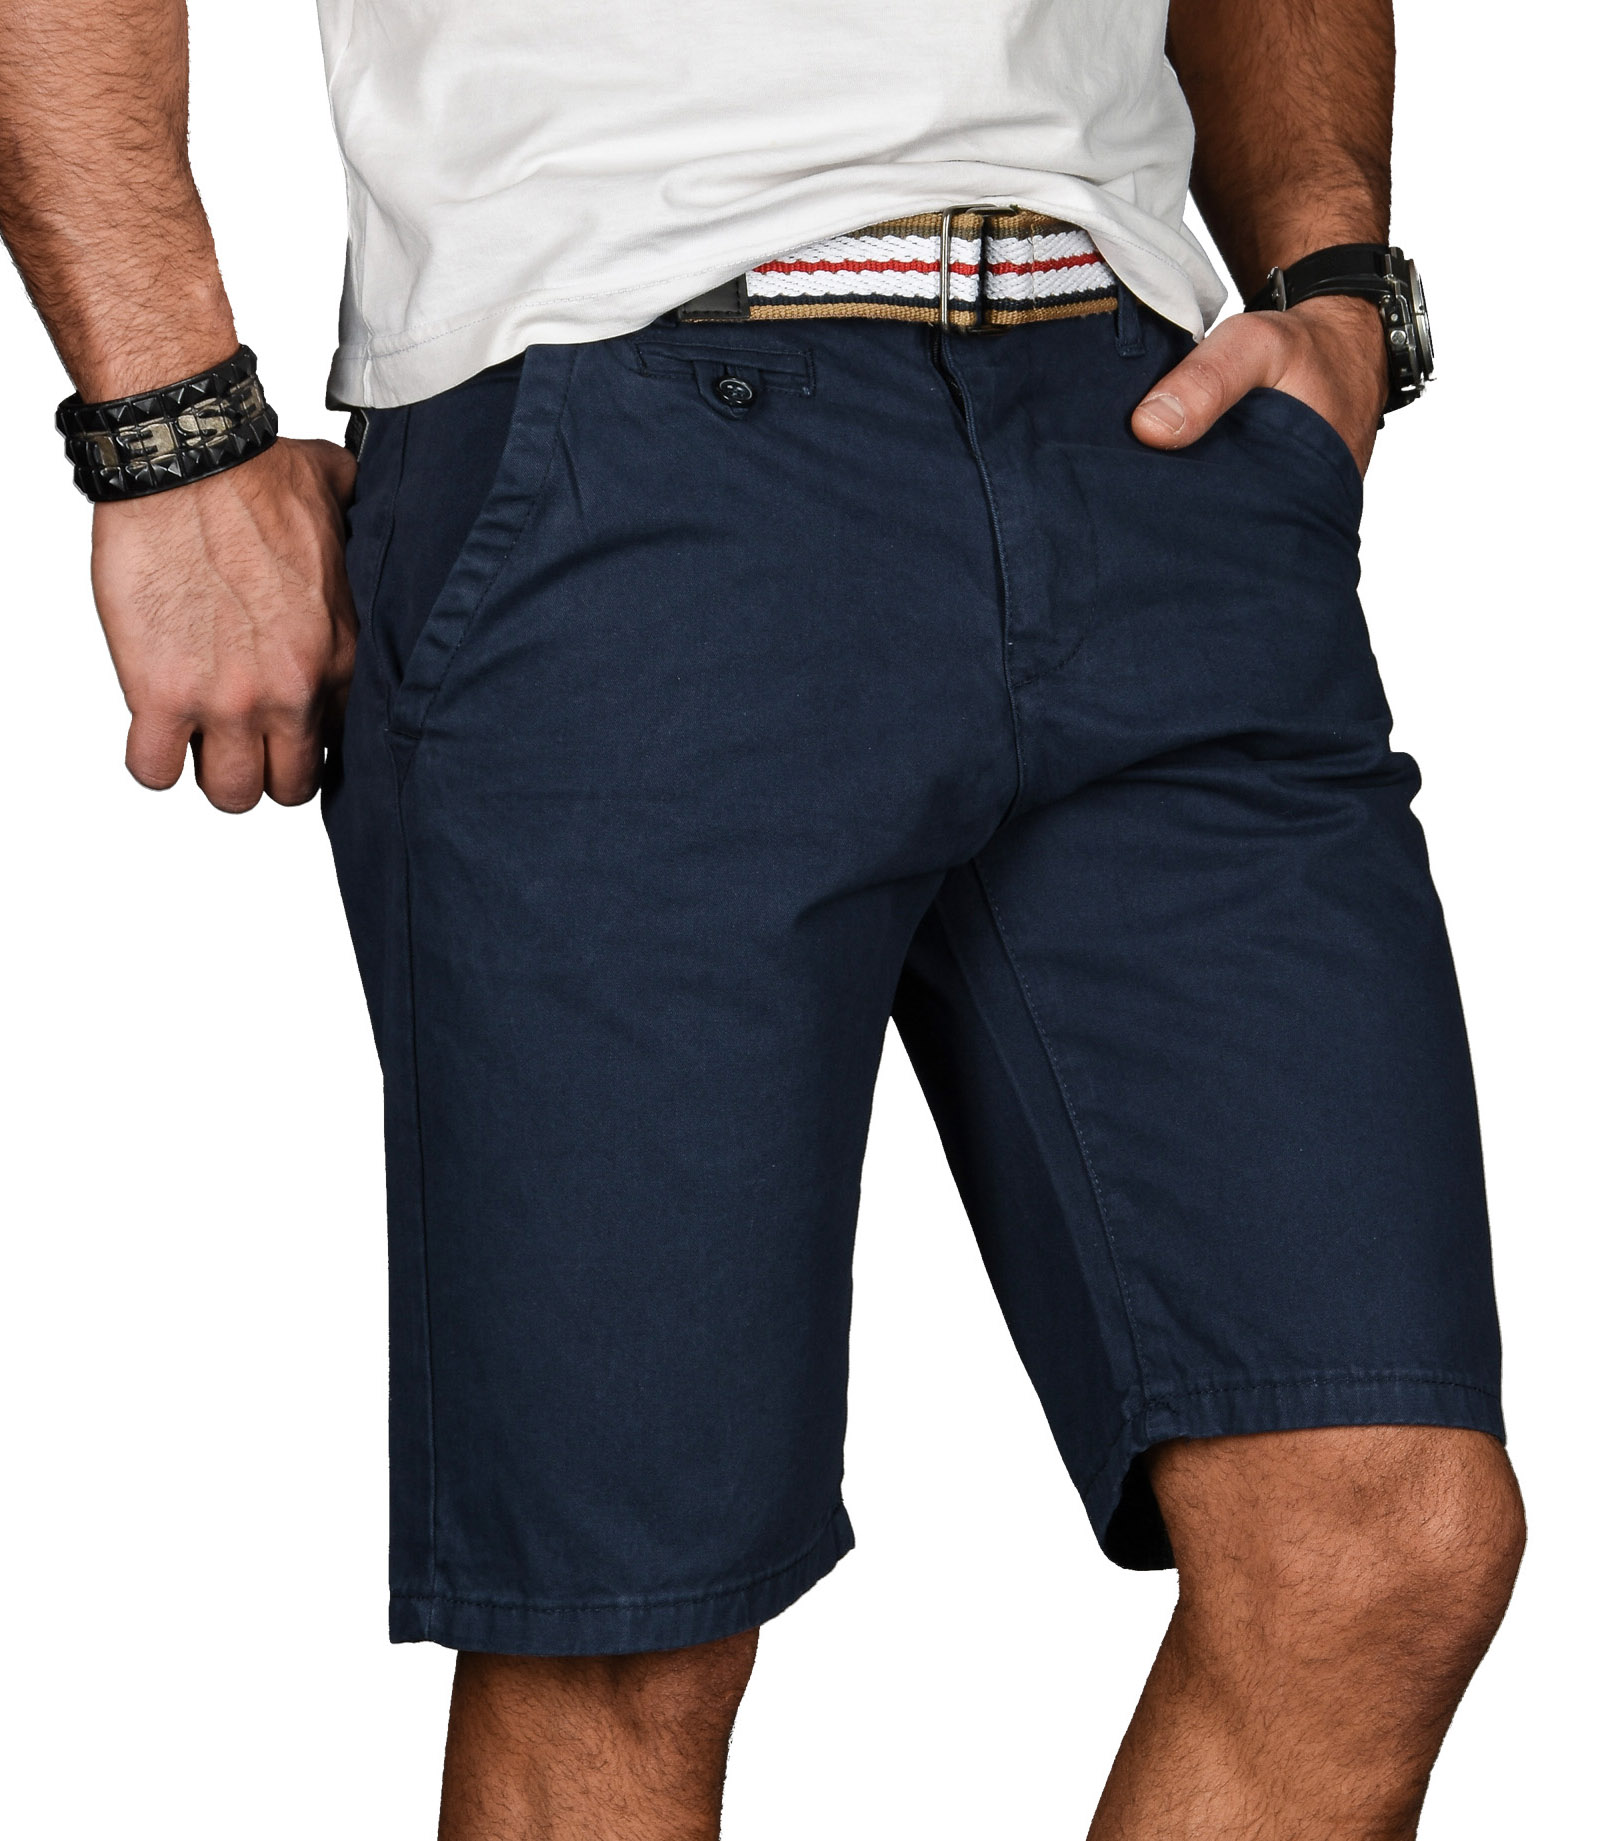 A-Salvarini-Herren-Shorts-kurze-Sommer-Hose-mit-Guertel-Short-Bermuda-NEU-AS096 Indexbild 9